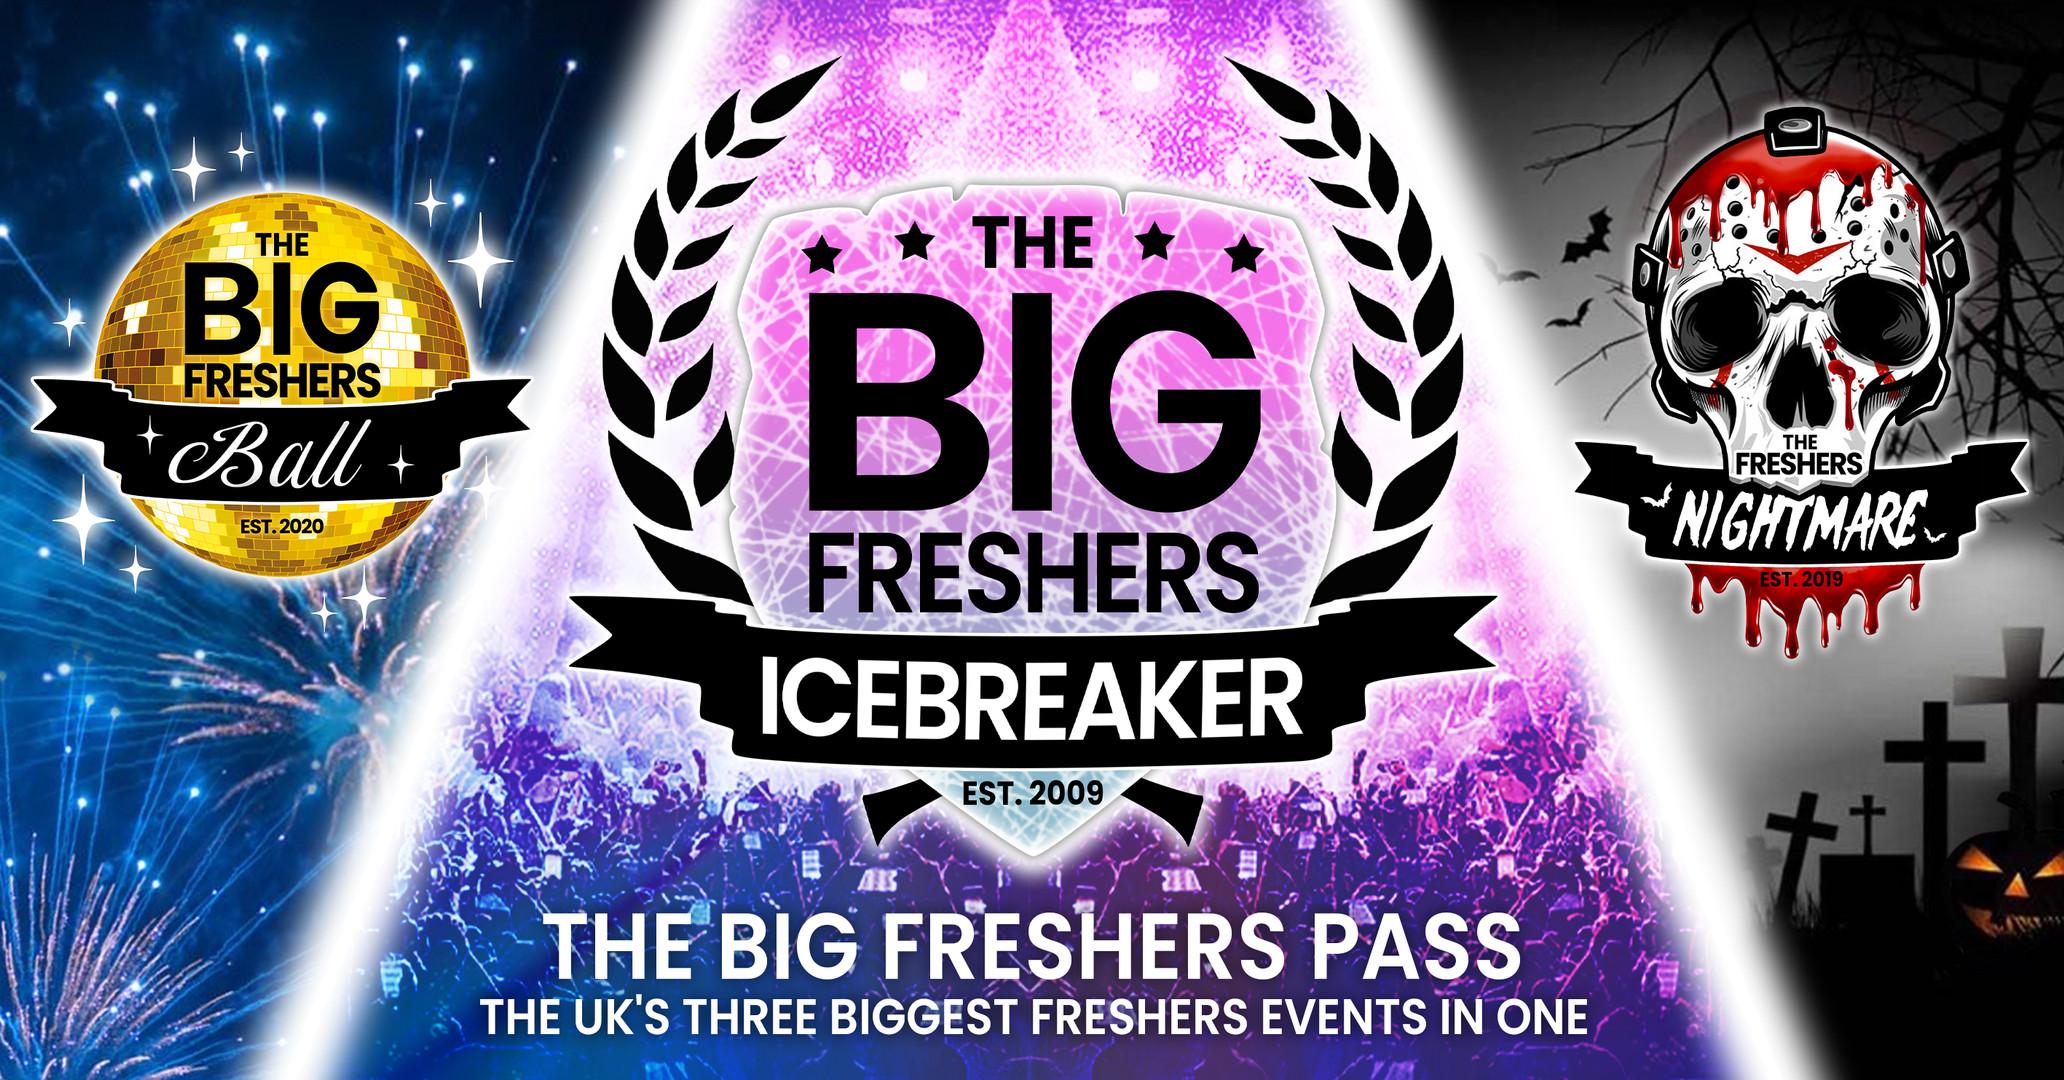 The Big Freshers Icebreaker Poster Design